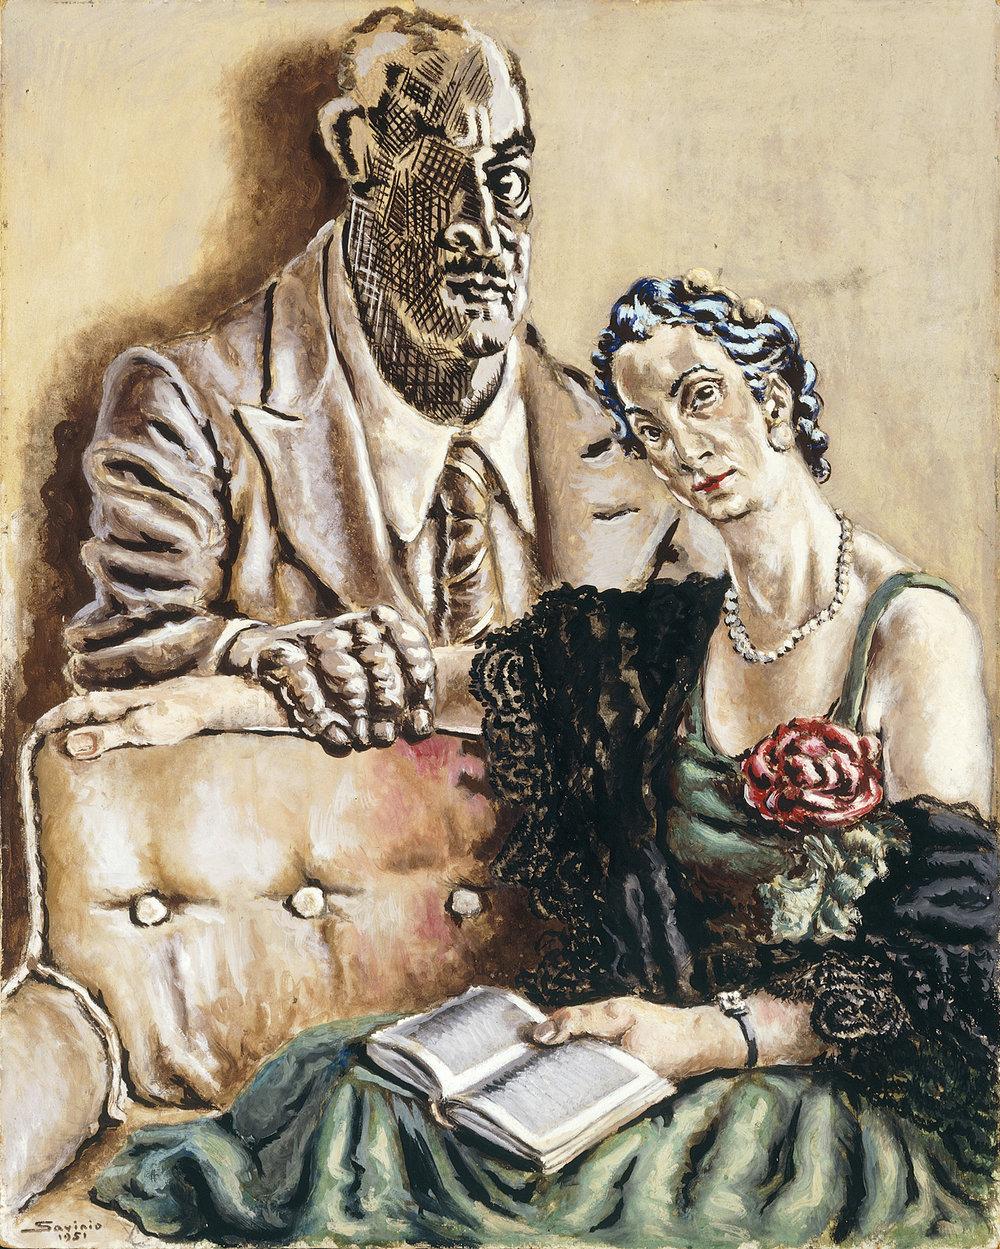 1951, 12, p.226, Mésalliance ovvero Matrimonio morganatico.jpg